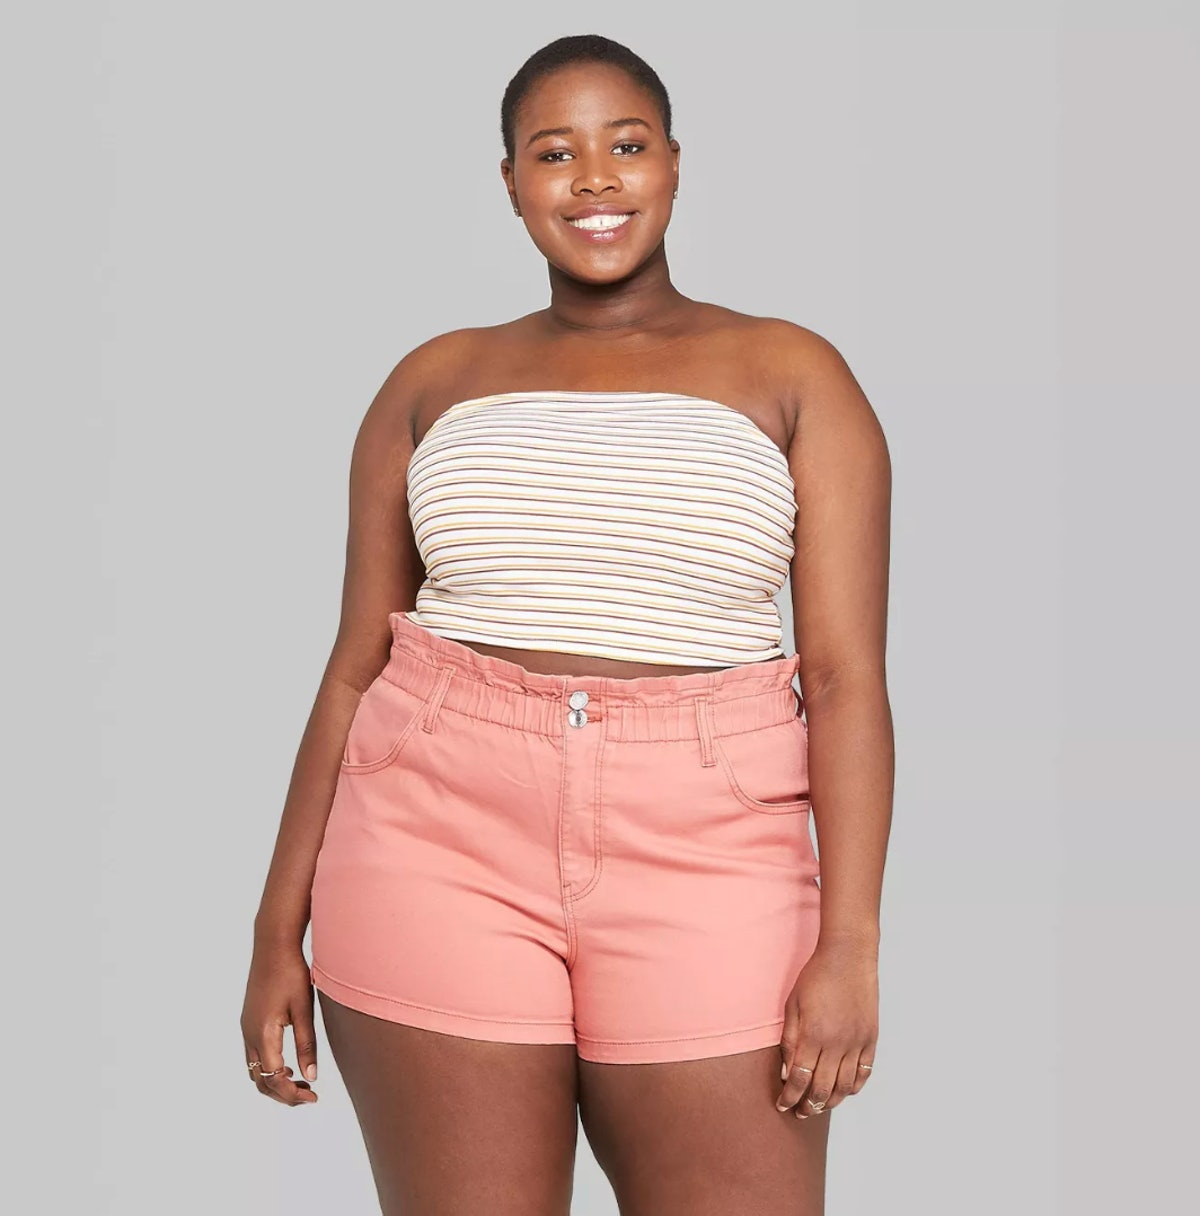 Women's Plus Size Striped Tube Top - Wild Fable